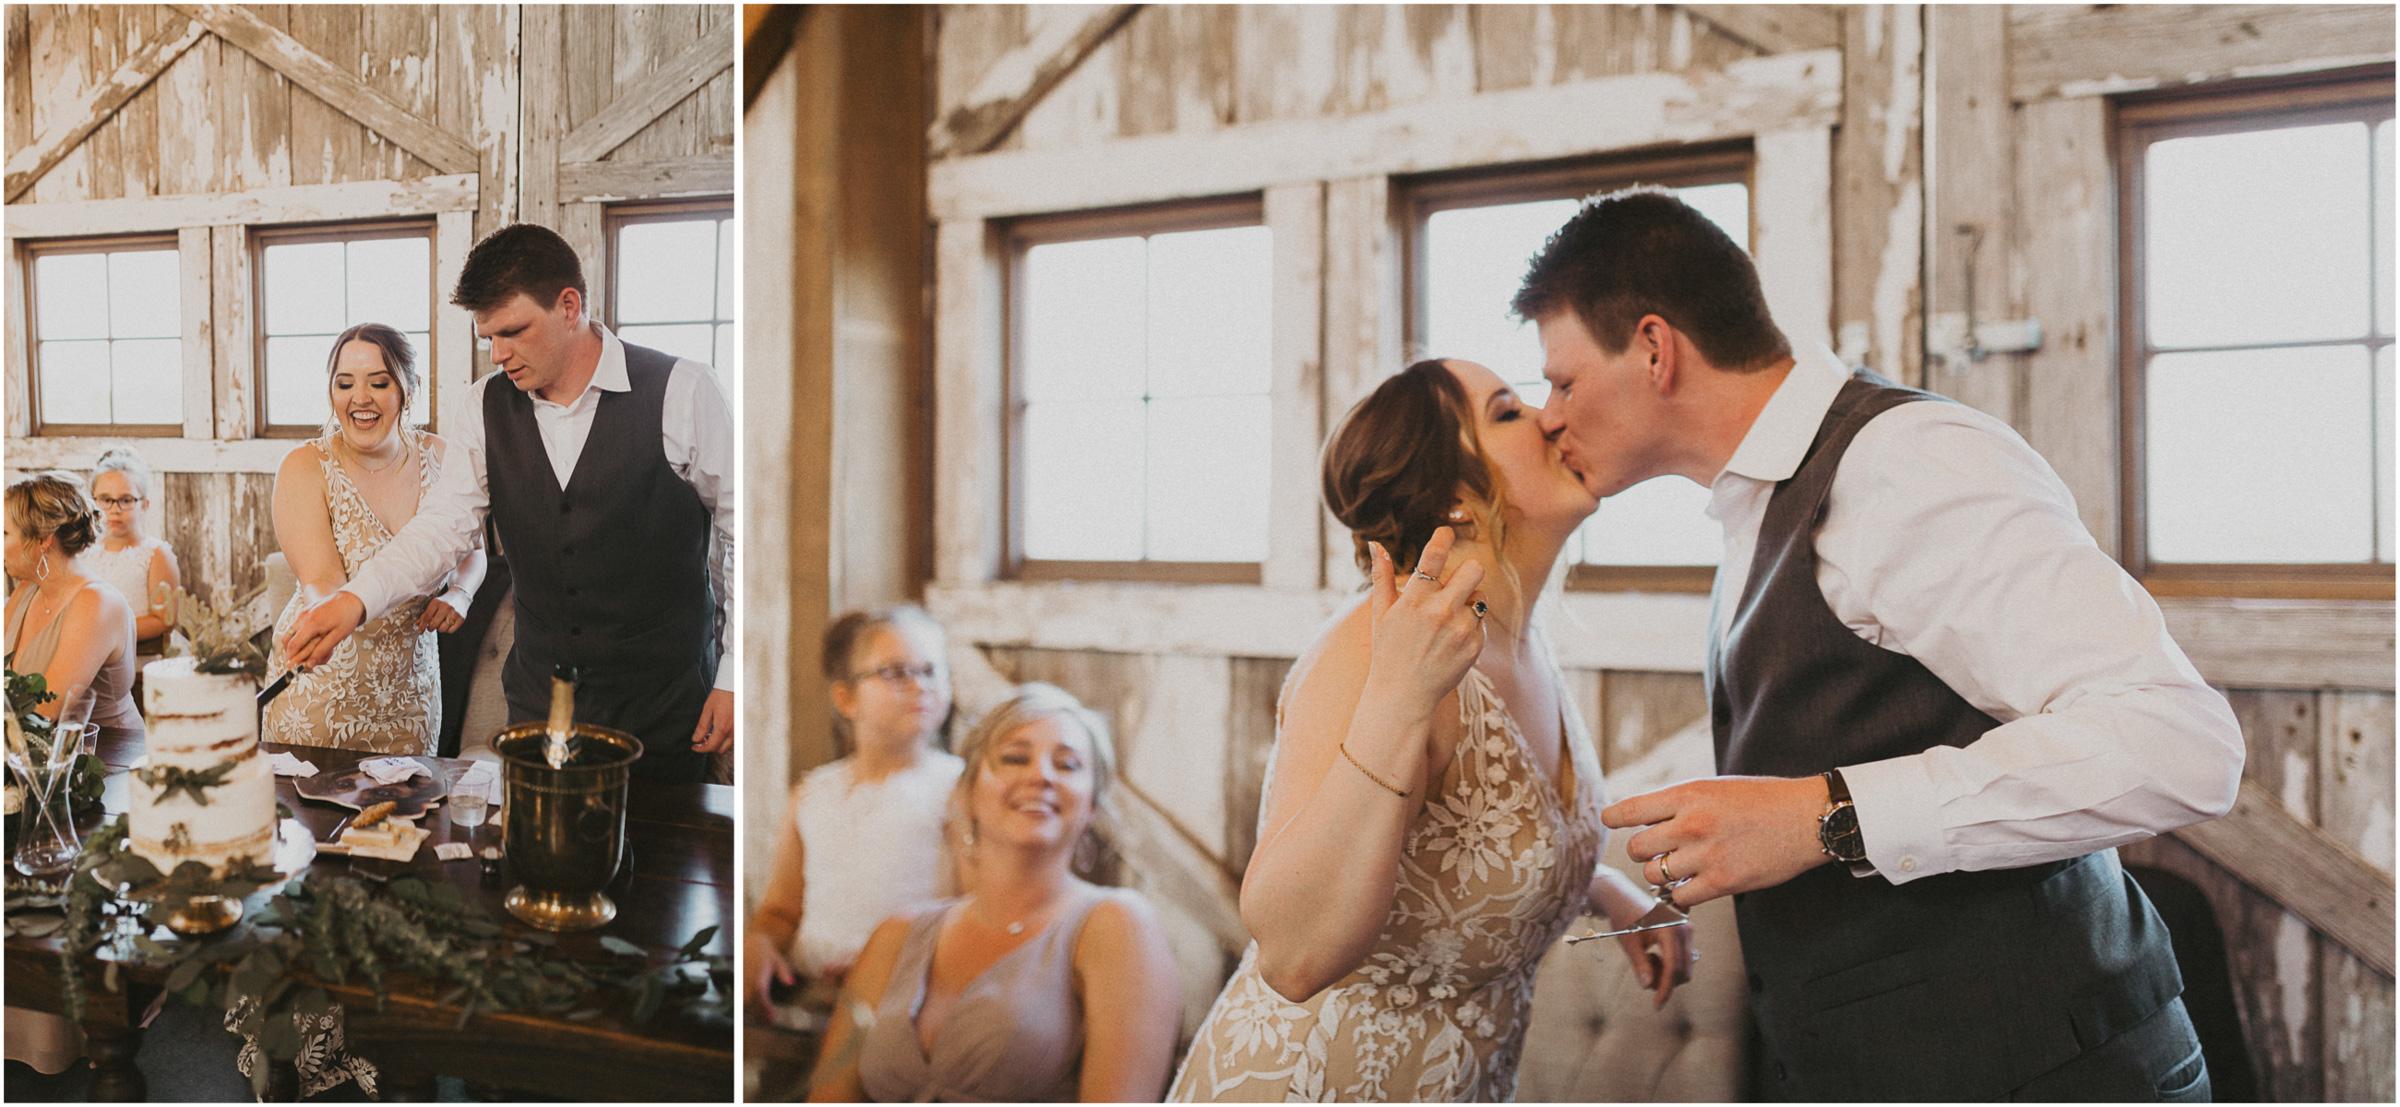 alyssa barletter photography weston red barn farm timberbarn summer outdoor wedding-63.jpg